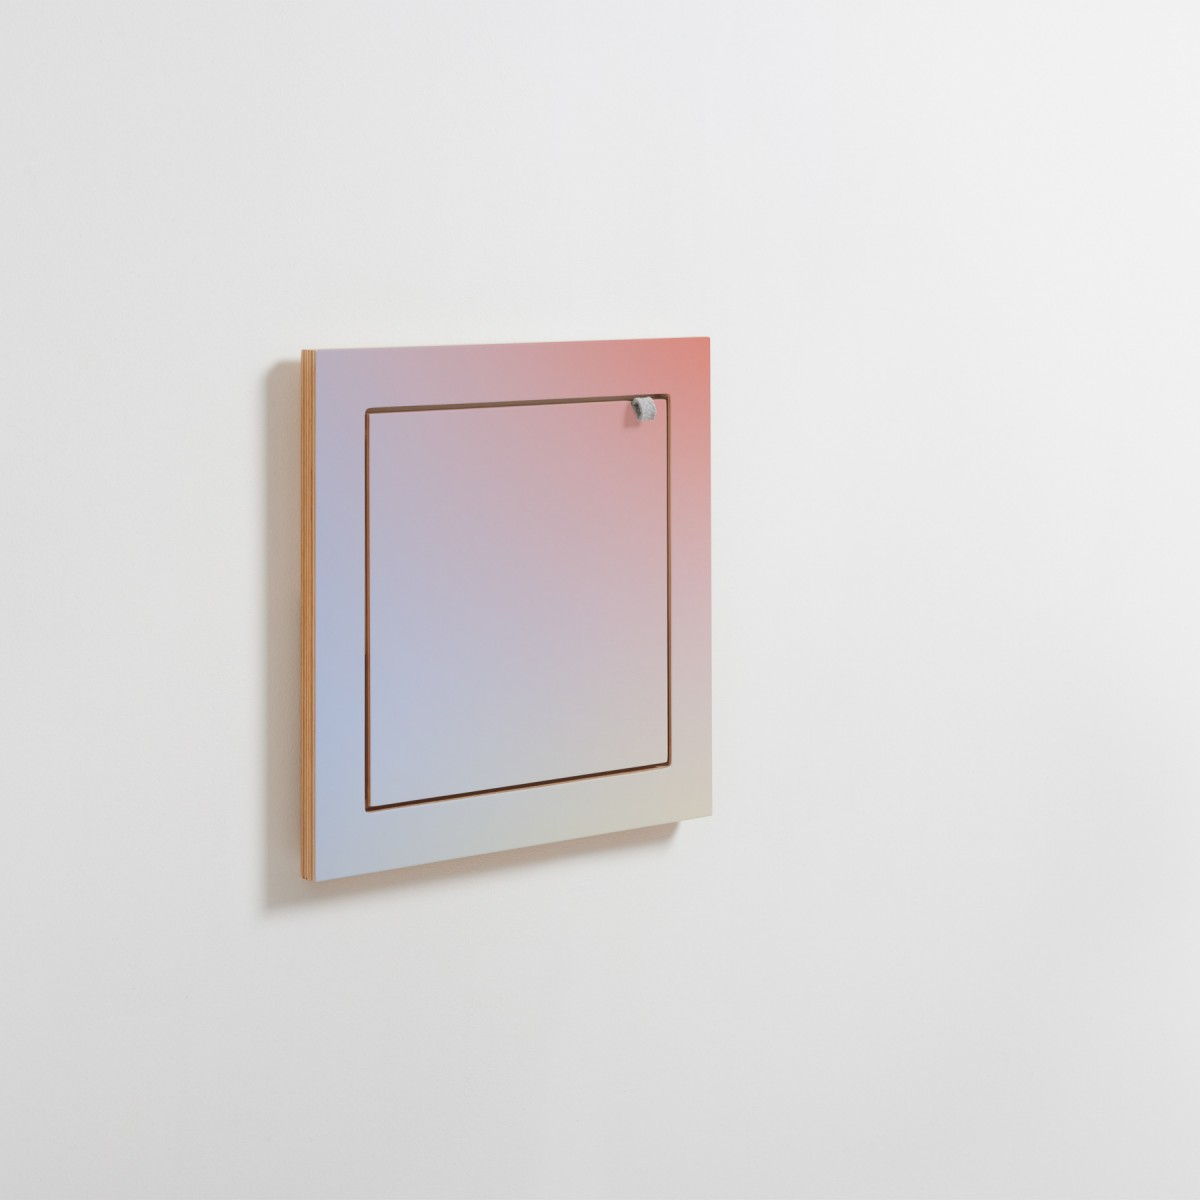 AMBIVALENZ Fläpps Regal 40x40-1 – Sunrise by Joa Herrenknecht